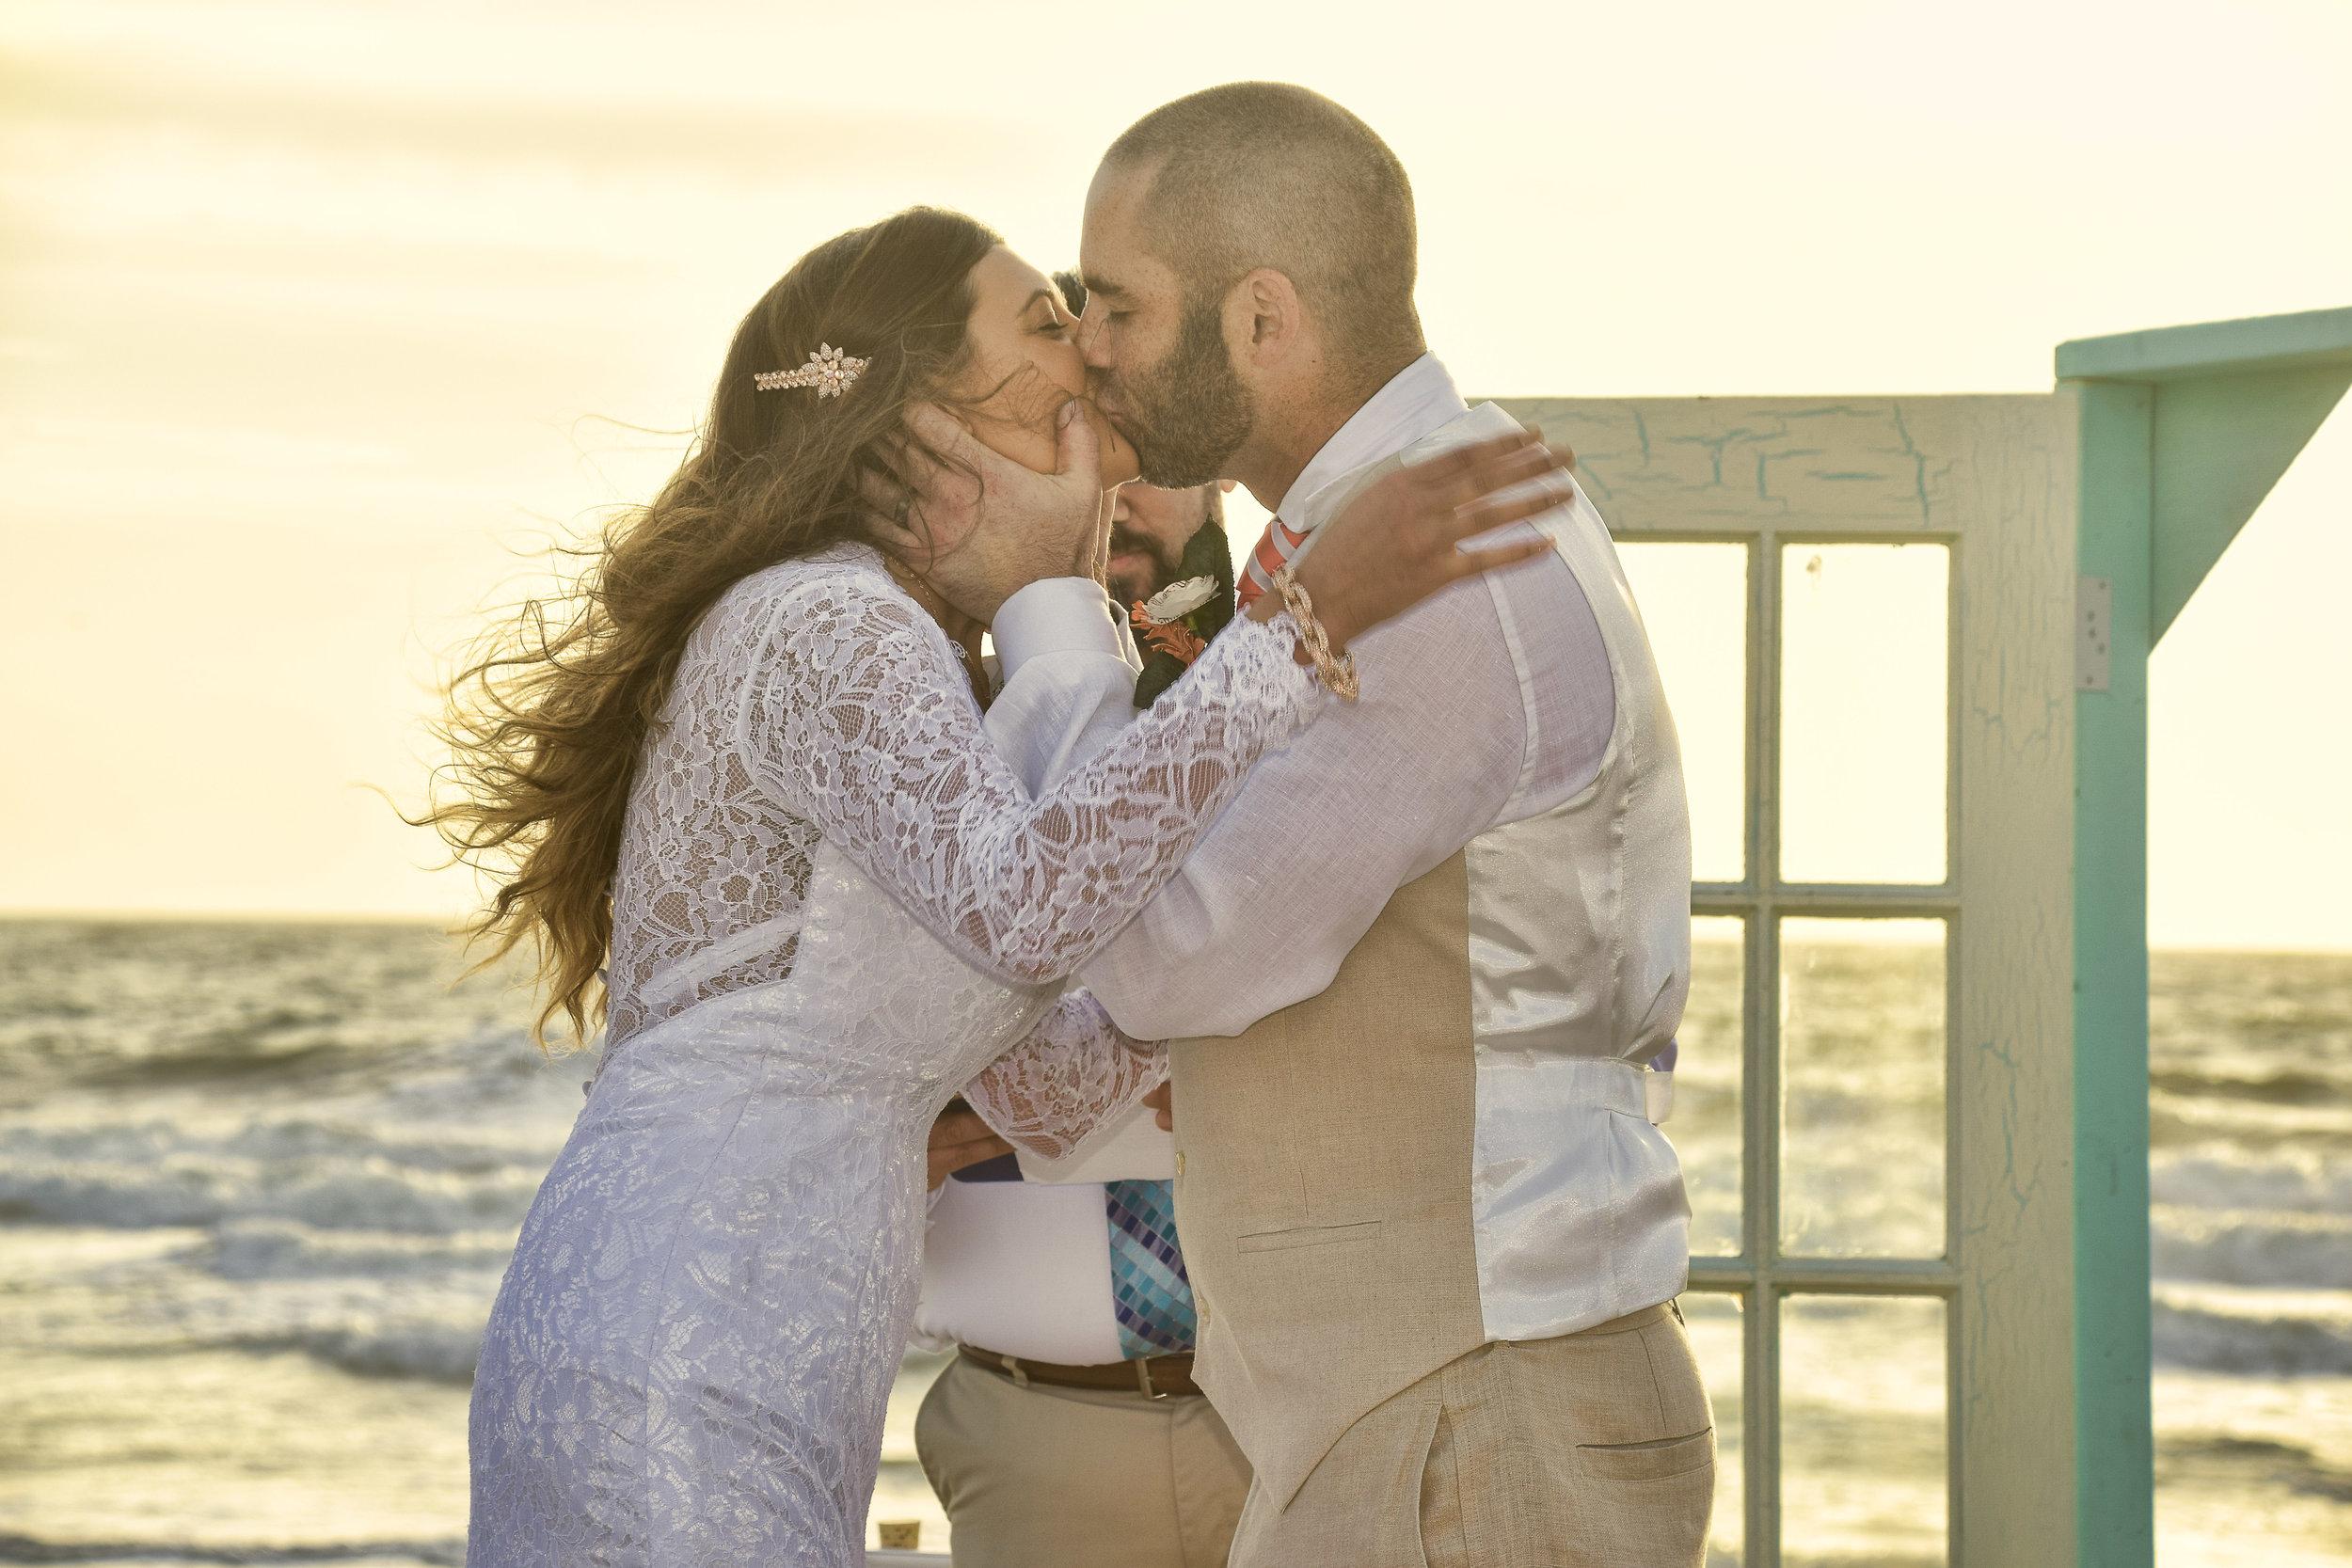 Kiss - First kiss at a sunrise wedding in Carolina Beach, NC. Billy Beach Photography.